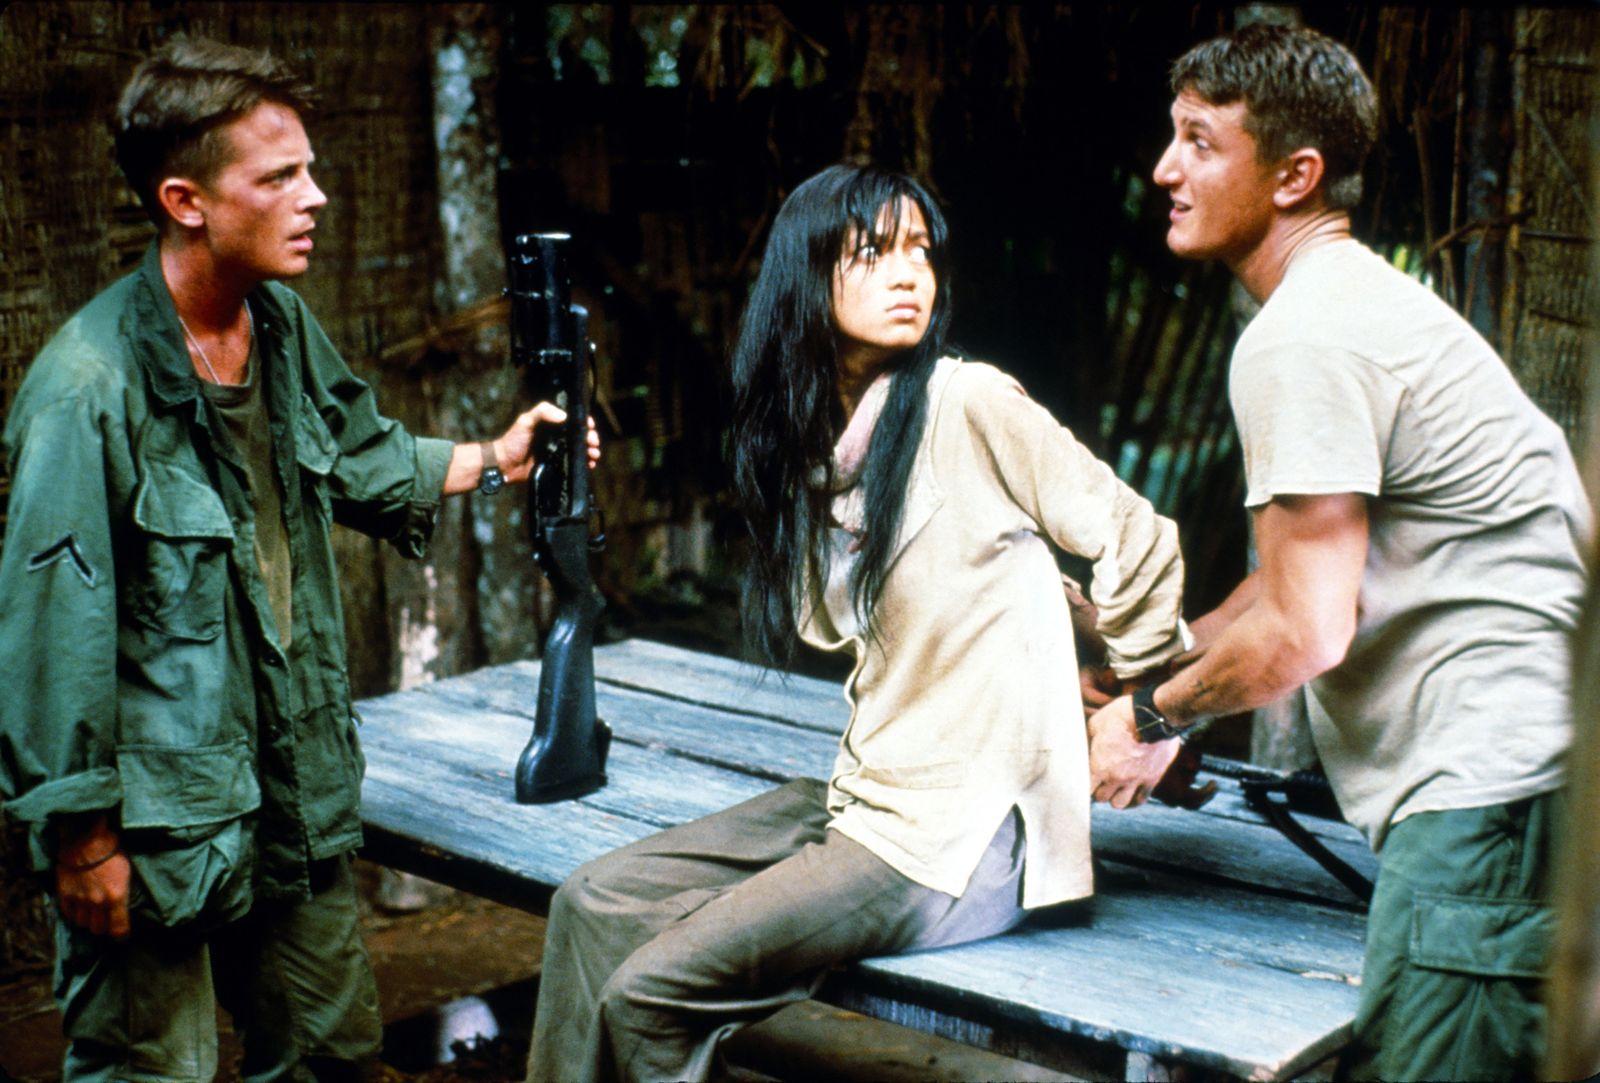 Michael Verhoeven - CASUALTIES OF WAR, Michael J. Fox, Thuy Thu Le, Sean Penn, 1989, (c) Columbia/courtesy Everett Colle